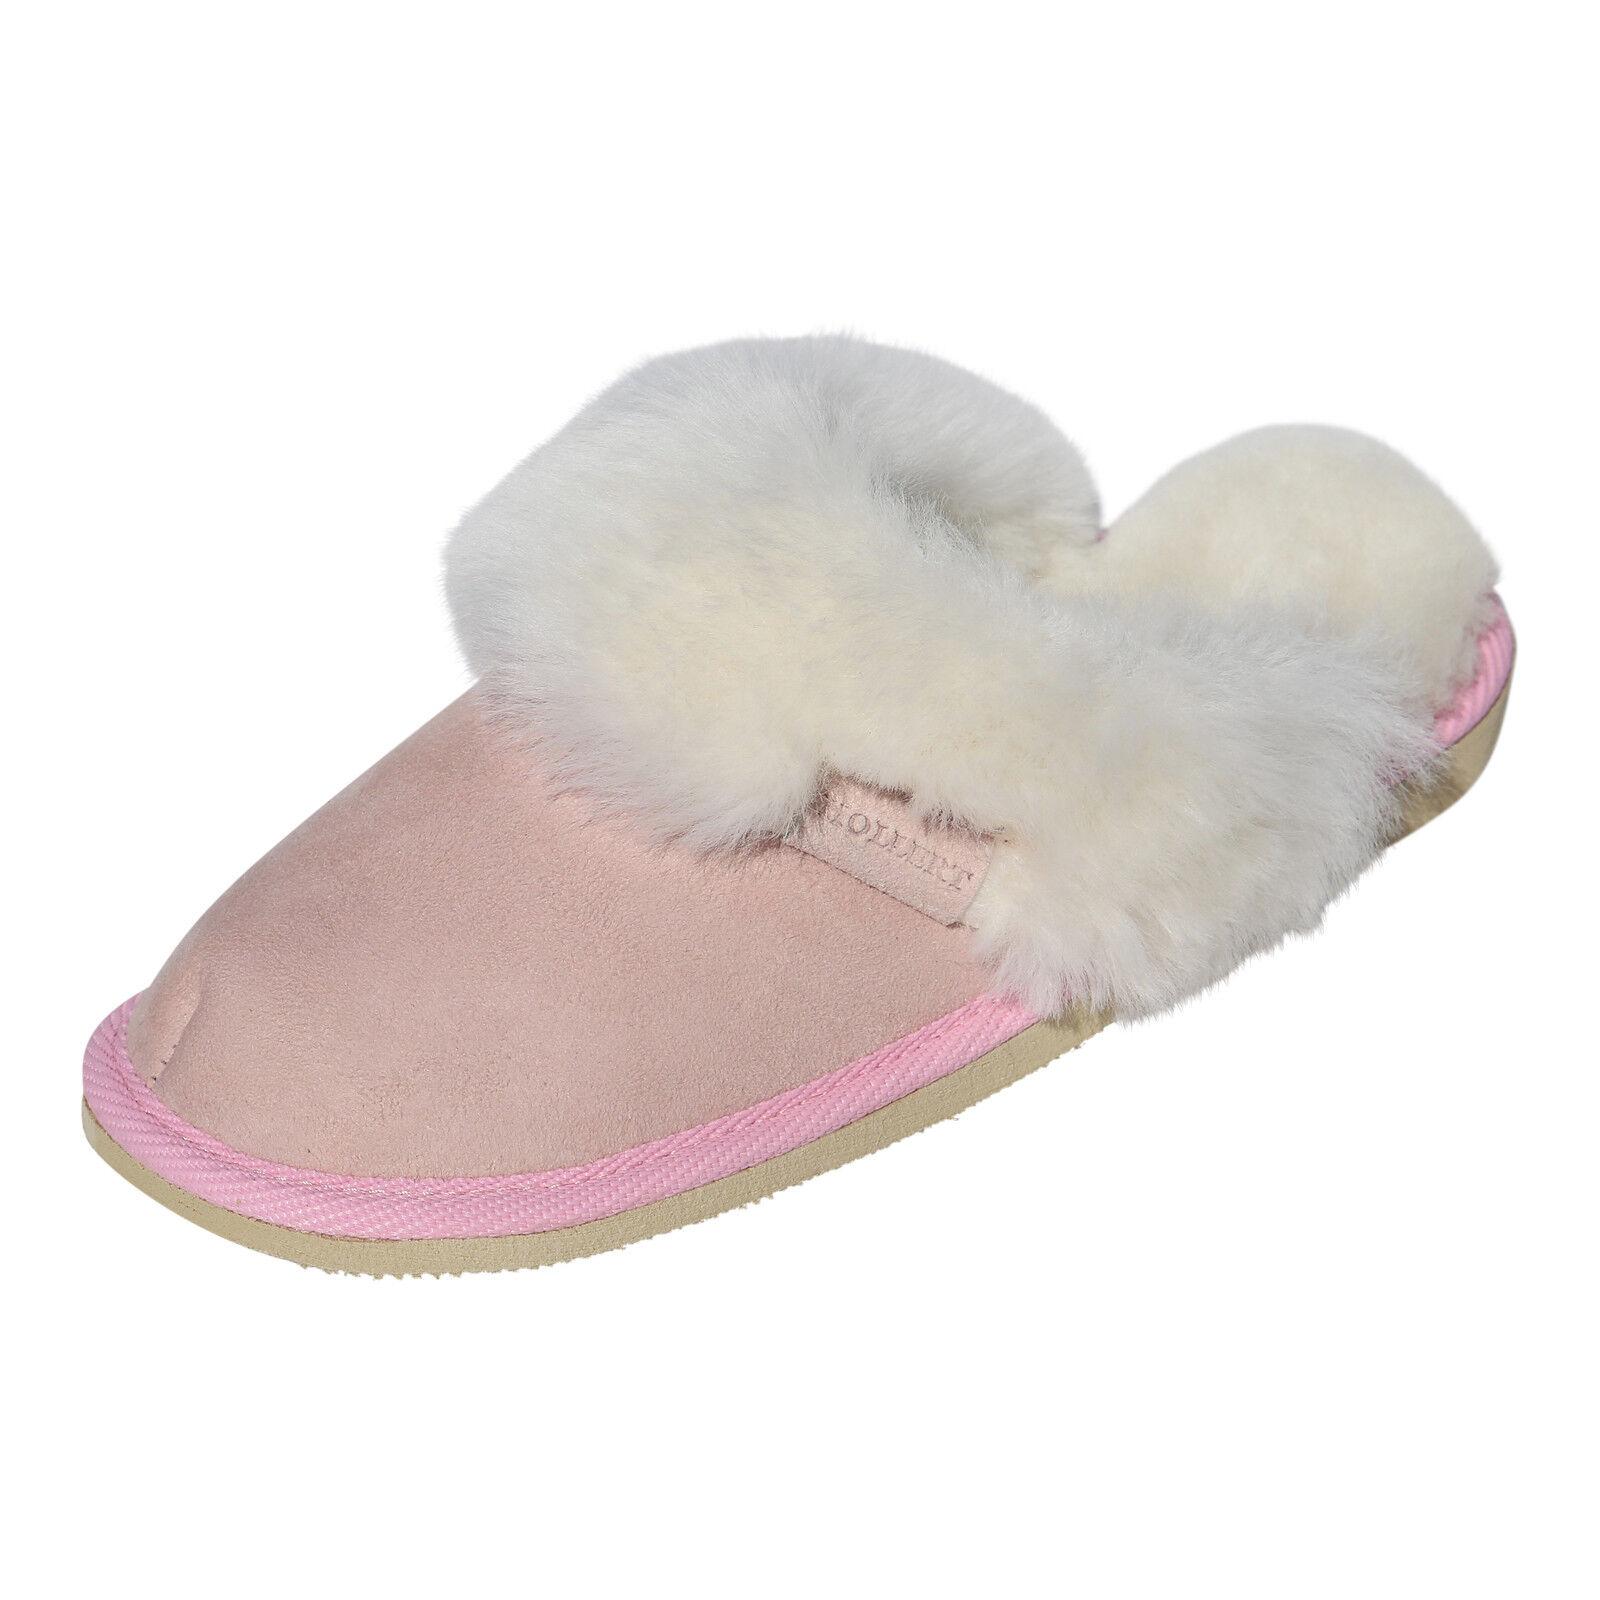 Pelle di pecora Pantofole donna MALIBU scarpe pelliccia cuoio